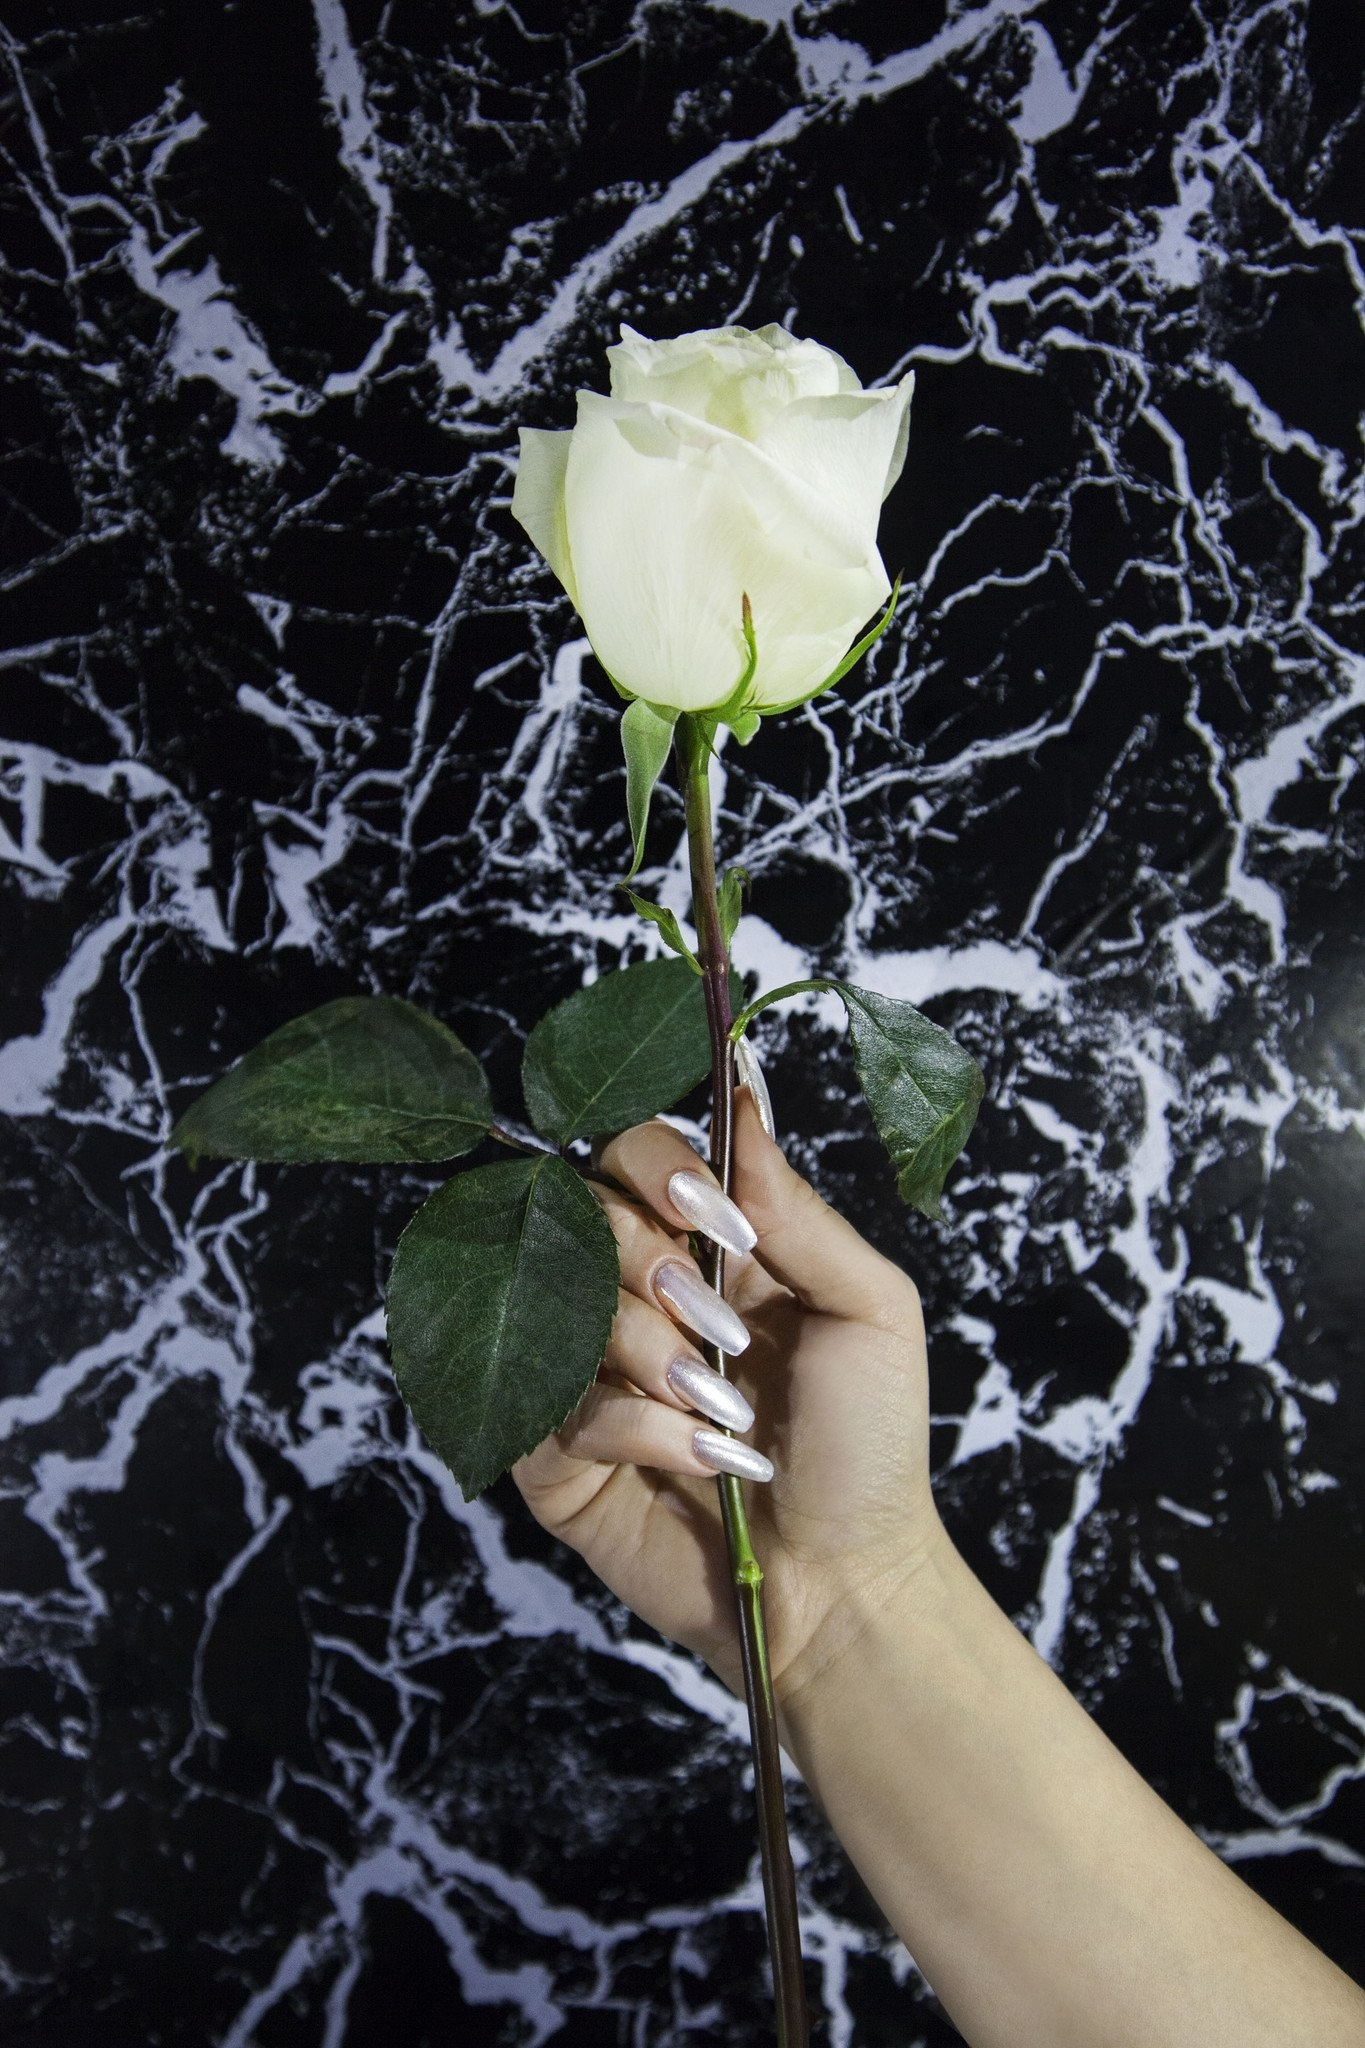 Floss Gloss 1080 Pearl, Opaque White Creme